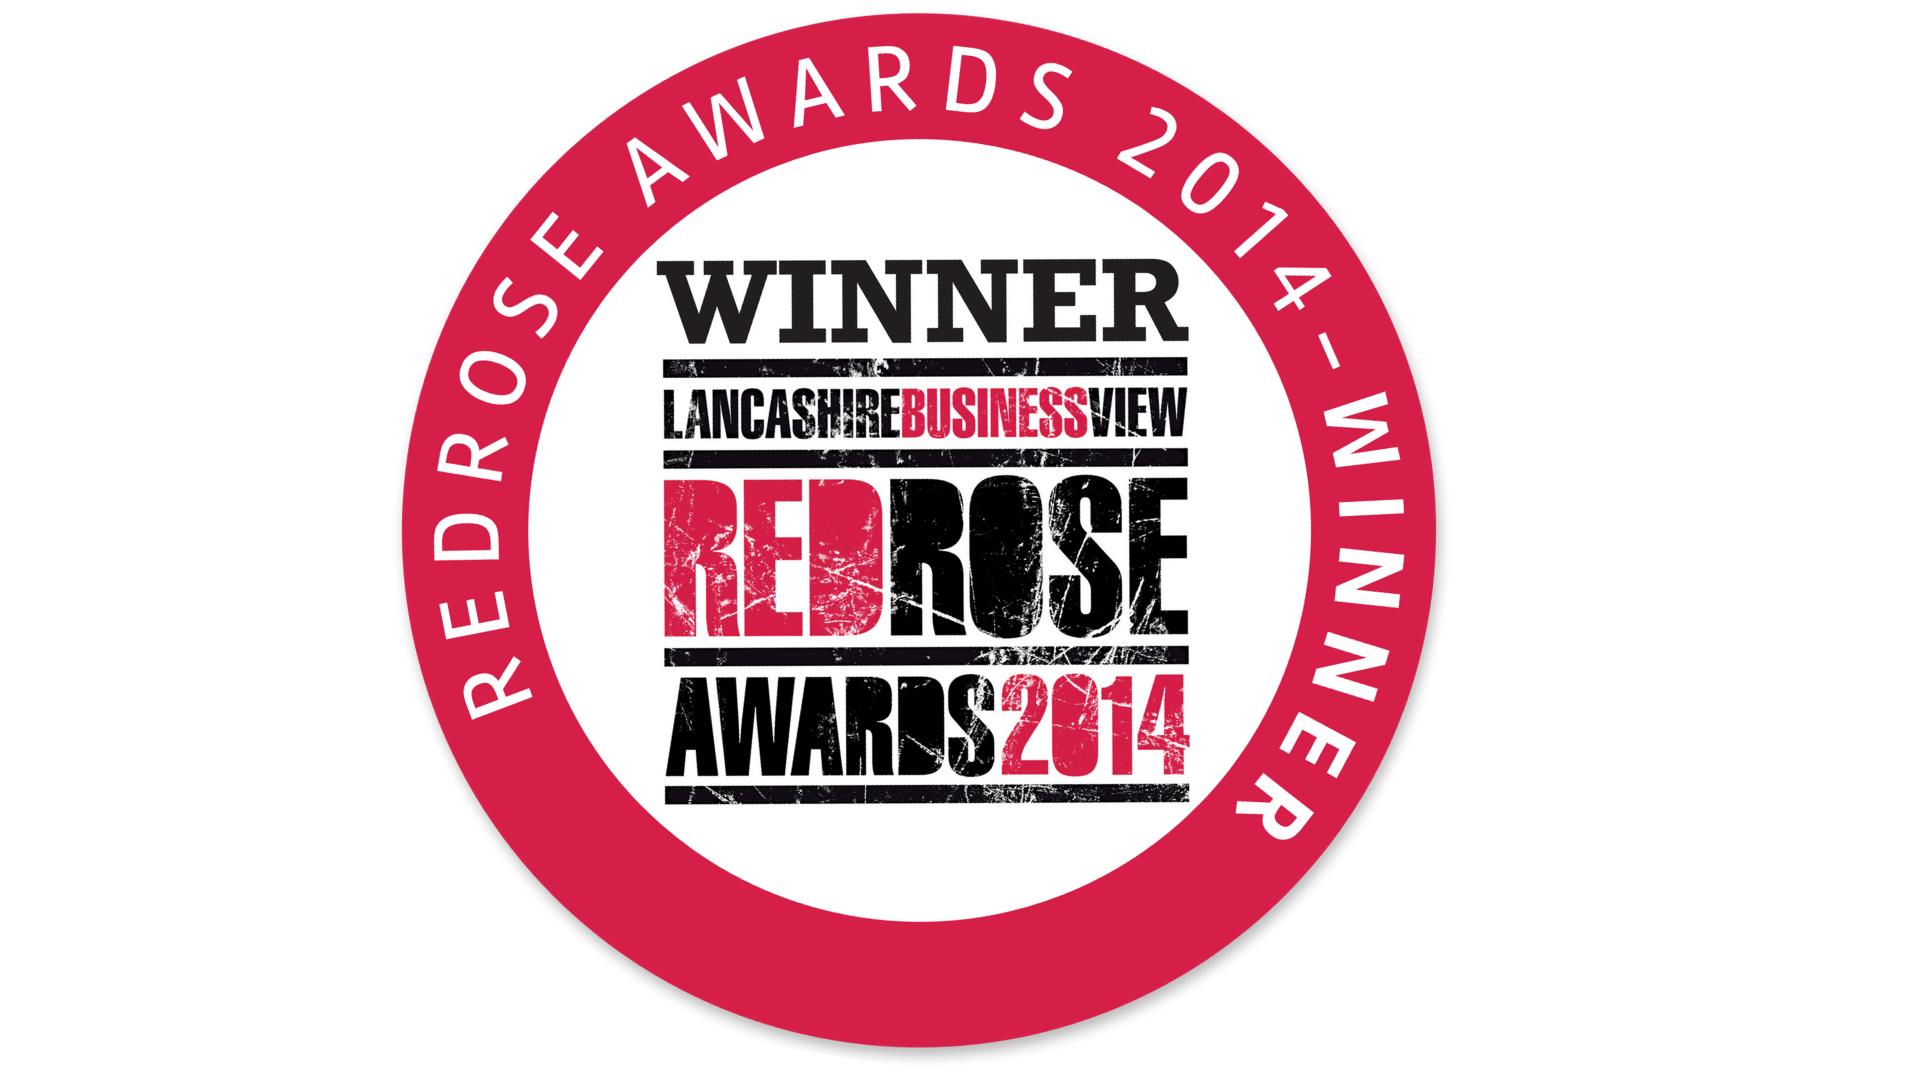 FUNDA Active Lancashire Red Rose Award Winners